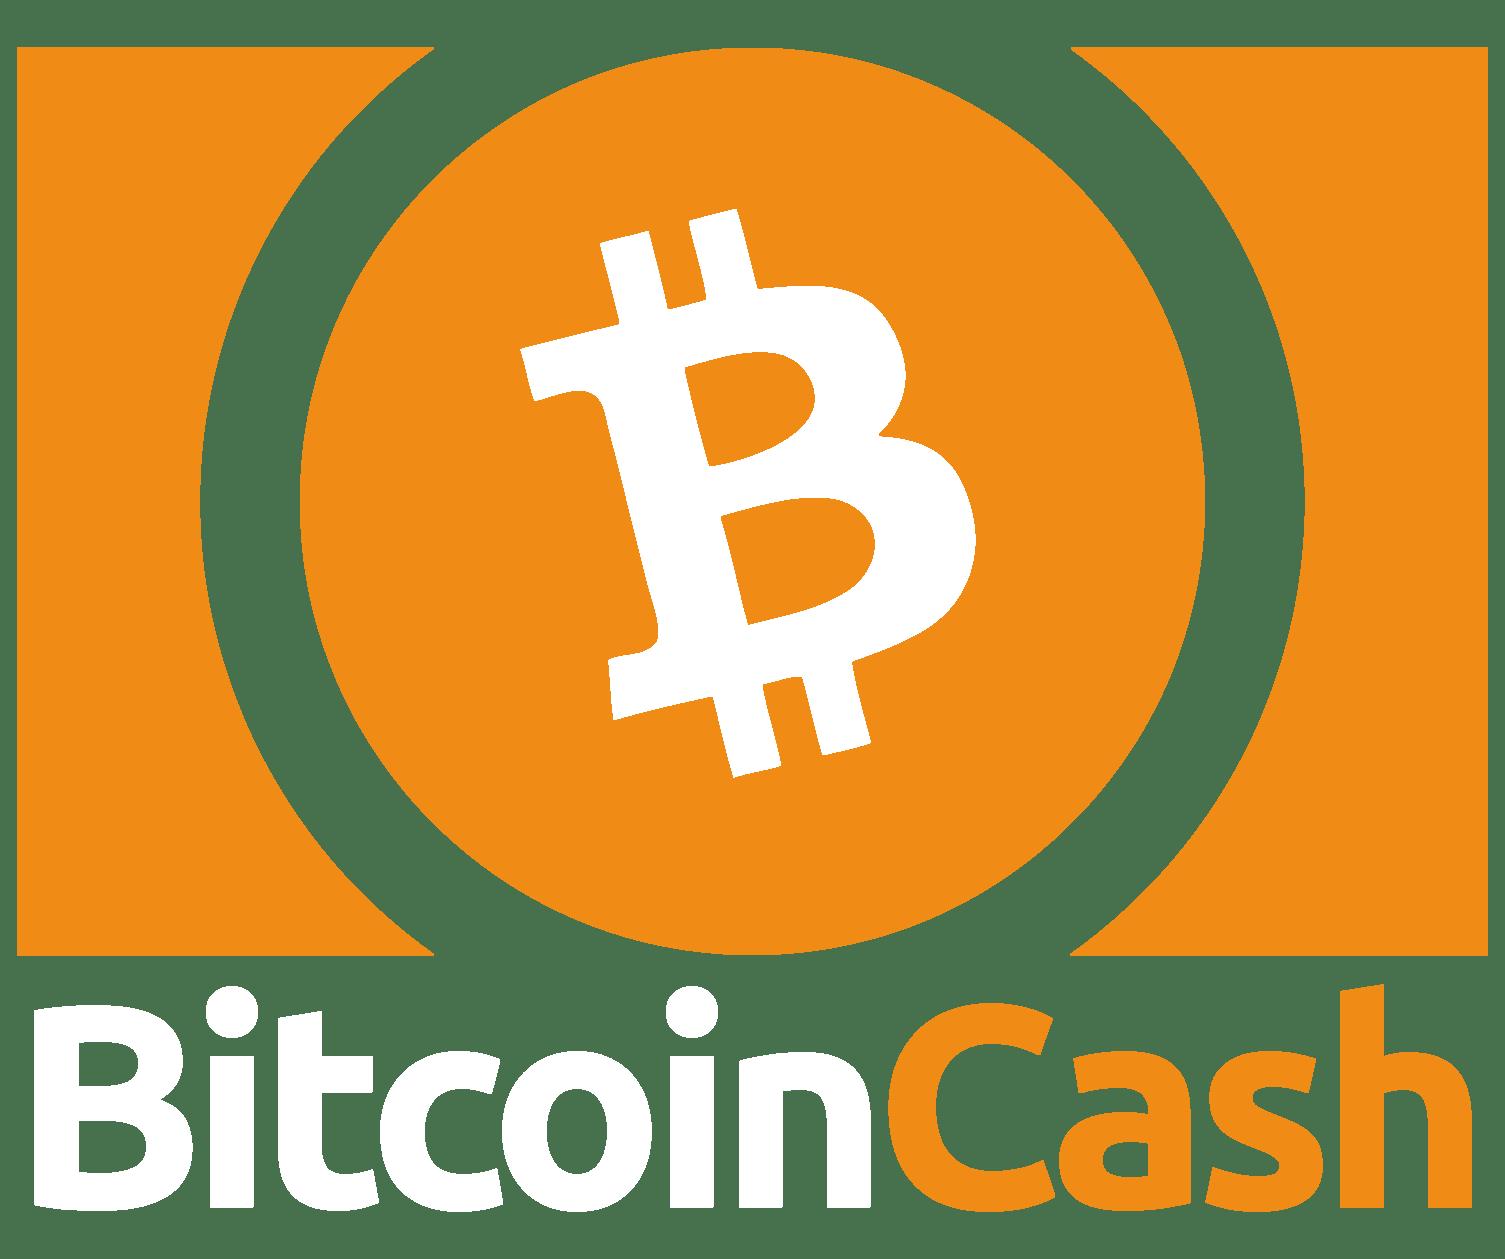 bitcoincash-white